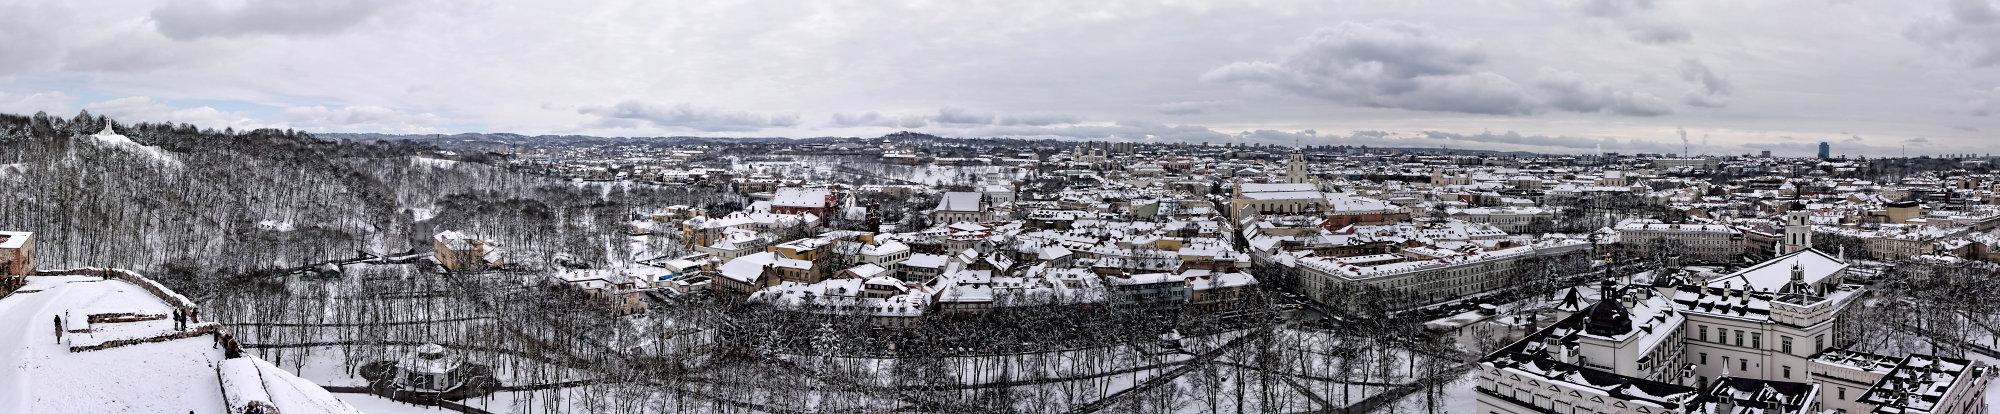 Vilnius Old Town Lithuania